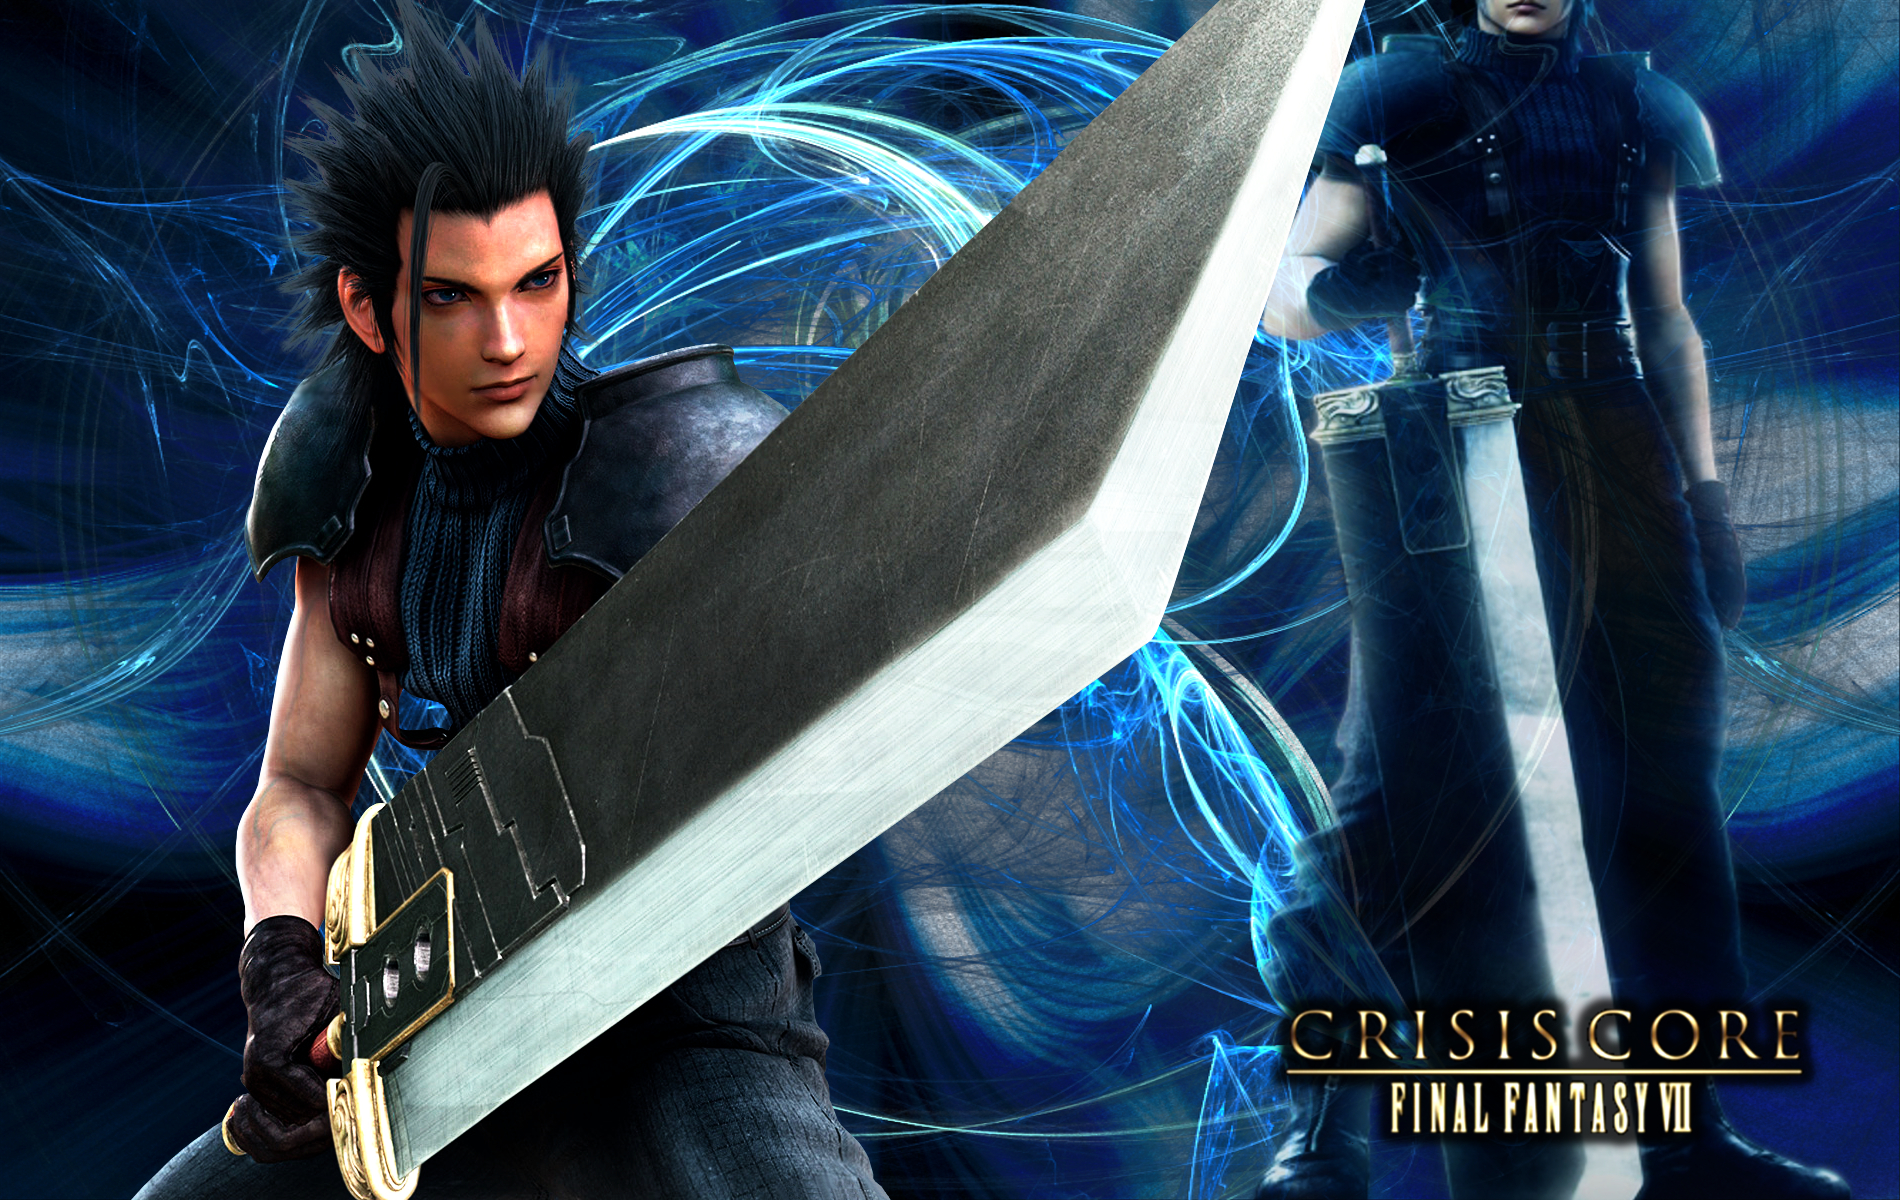 Final Fantasy 7 Crisis Core Zackfair By Viciousjosh On Deviantart